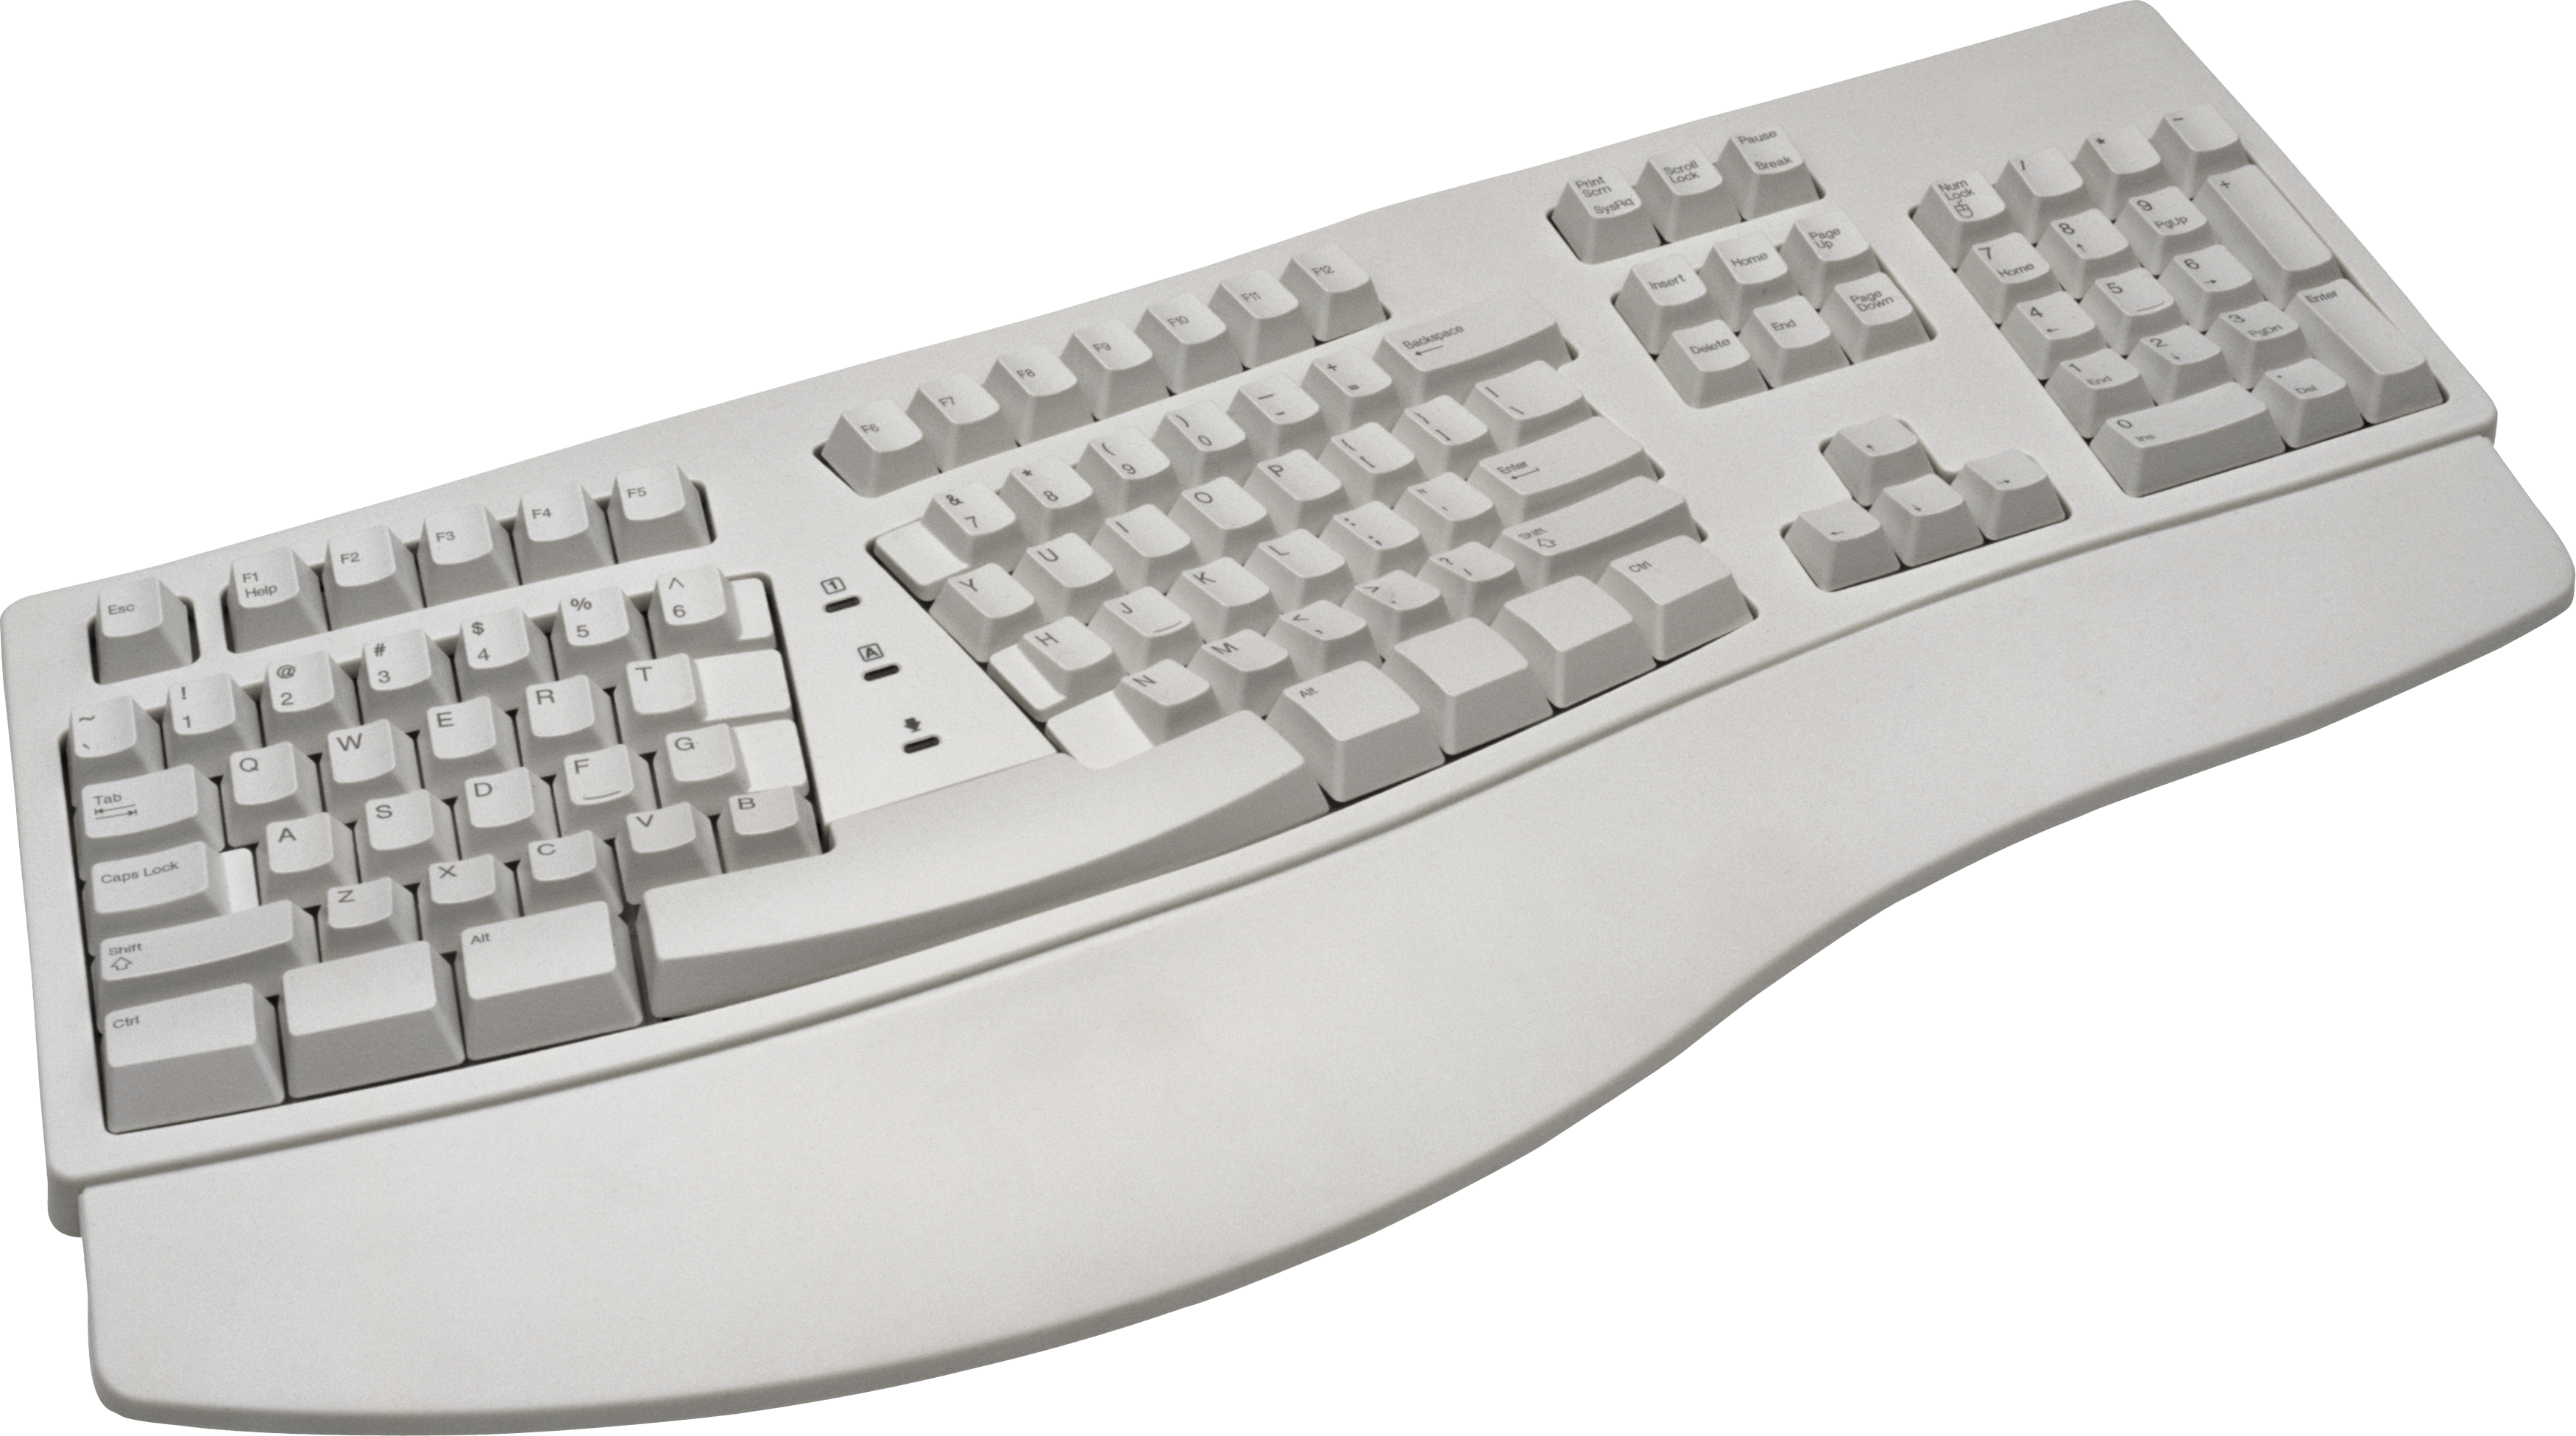 Download White Keyboard Png Image HQ PNG Image | FreePNGImg